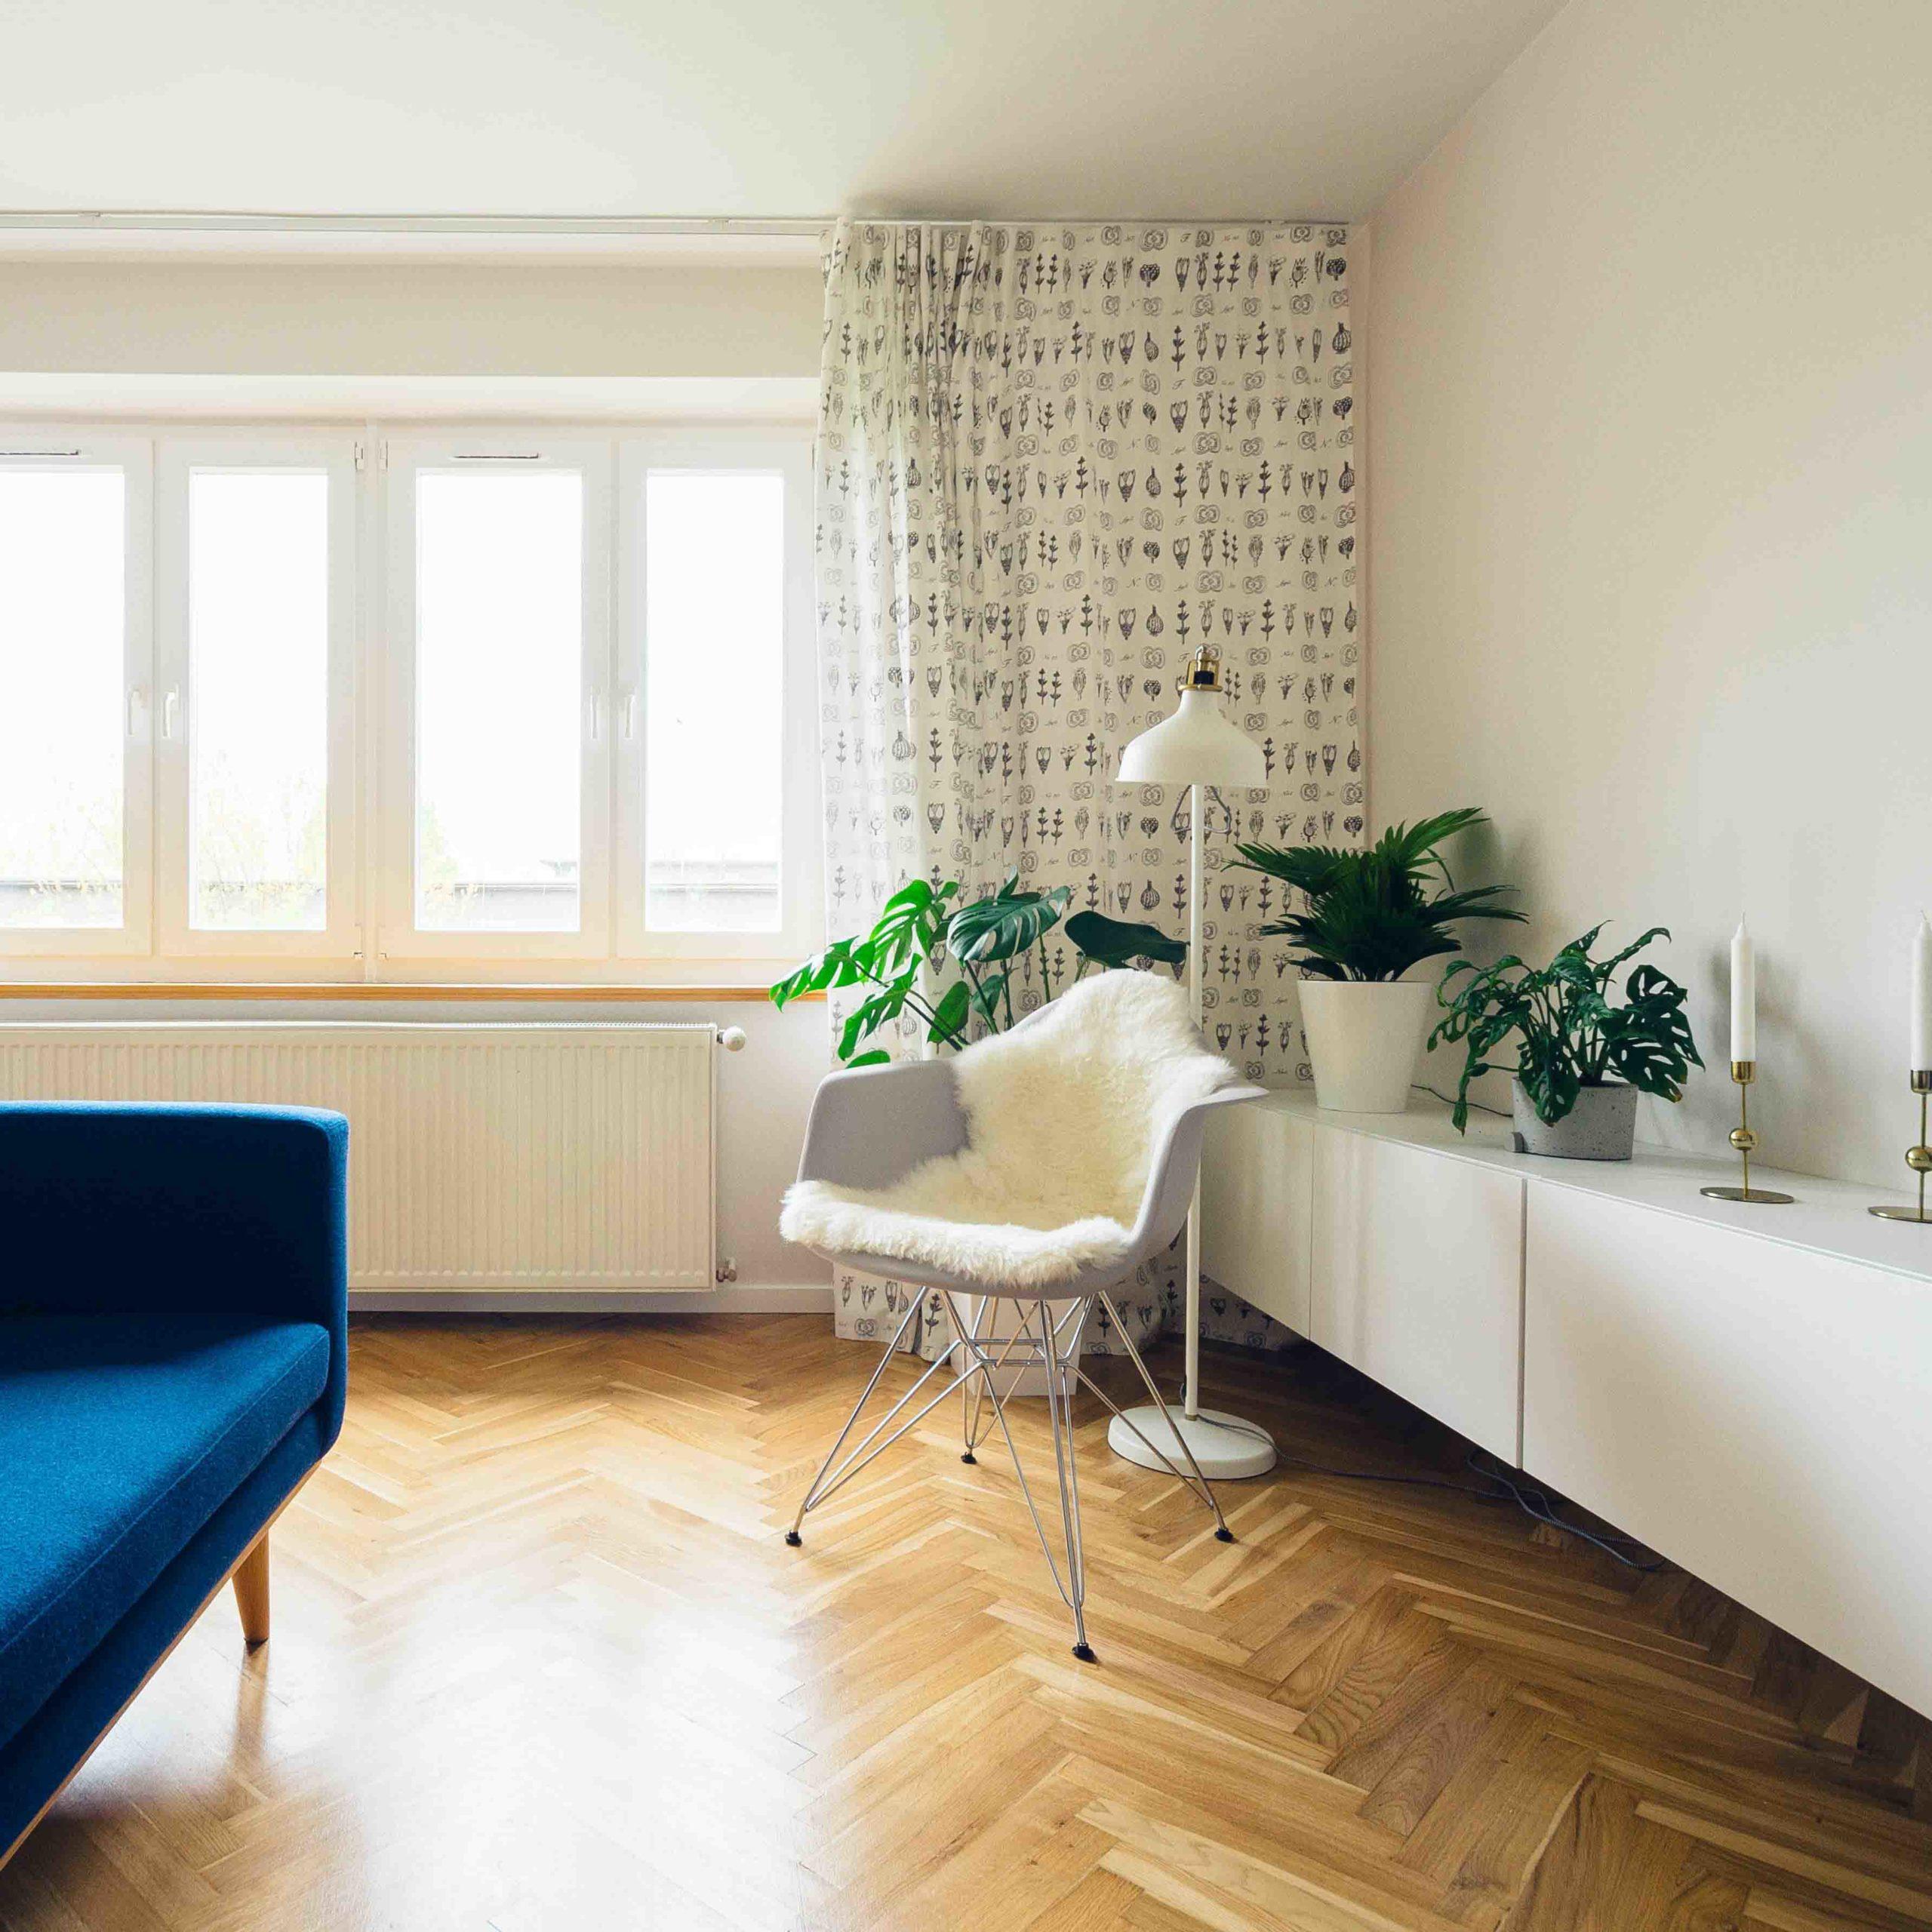 Appartement-meublé3-Investissement-locatif-ImAvenir